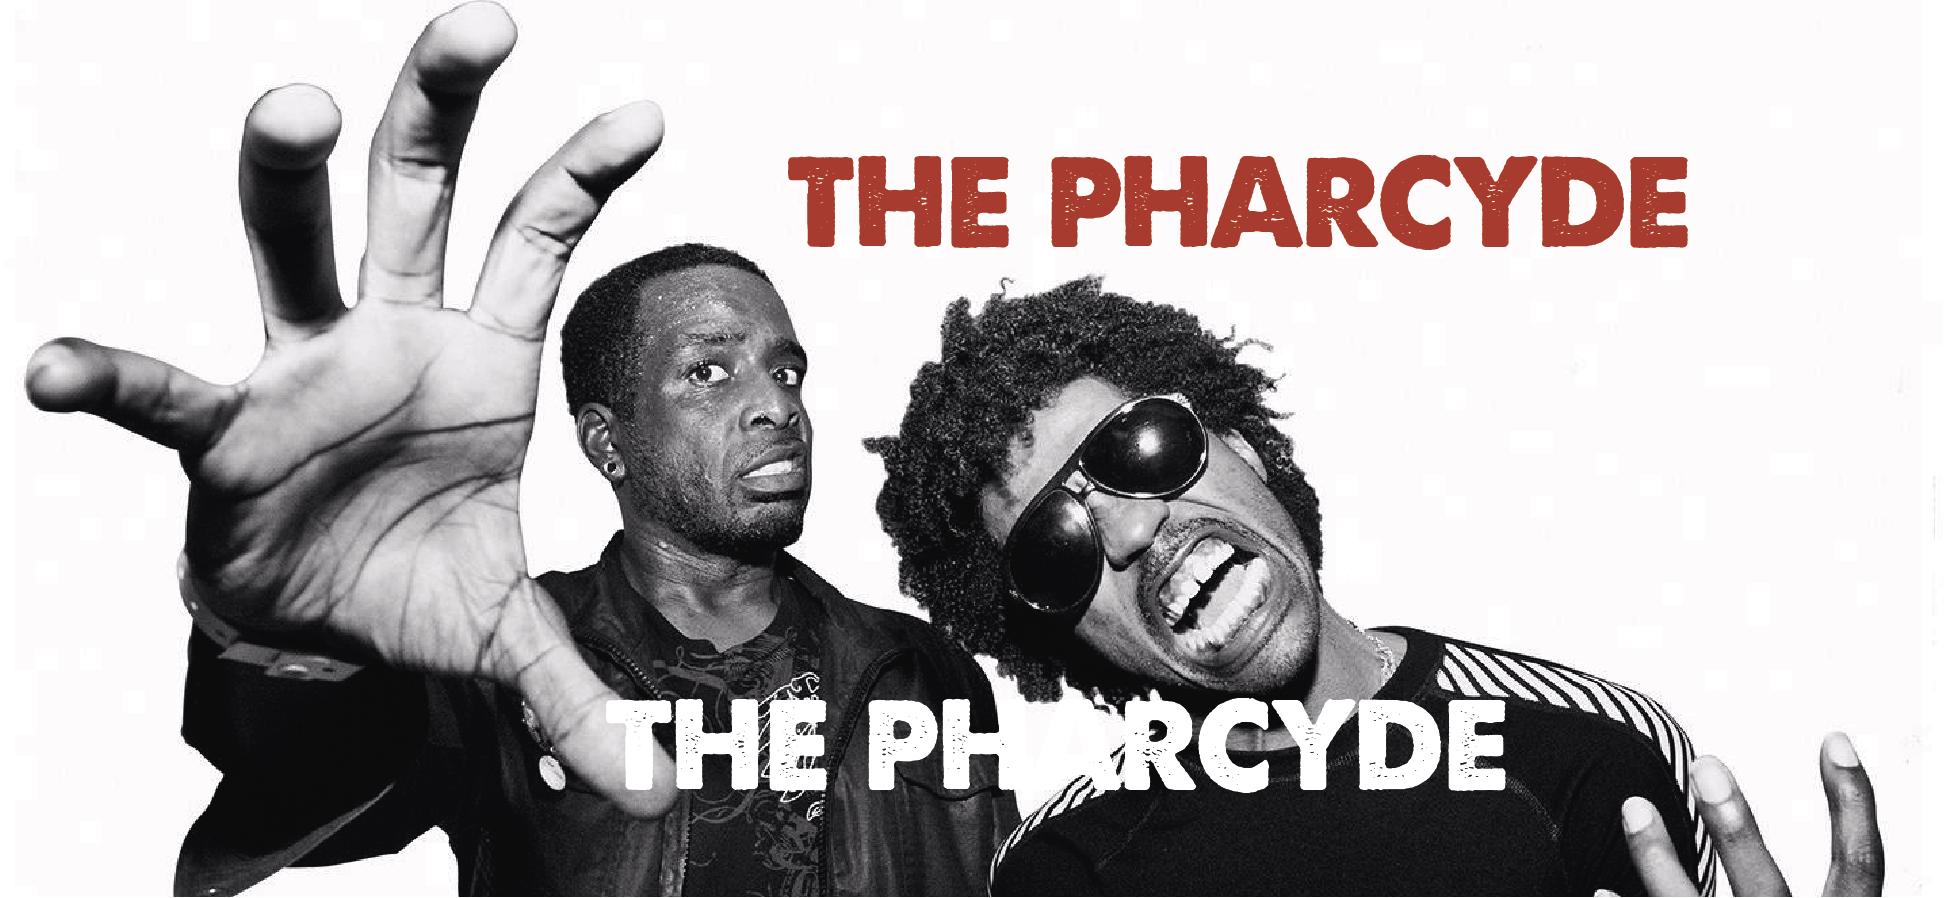 Profile: THE PHARCYDE